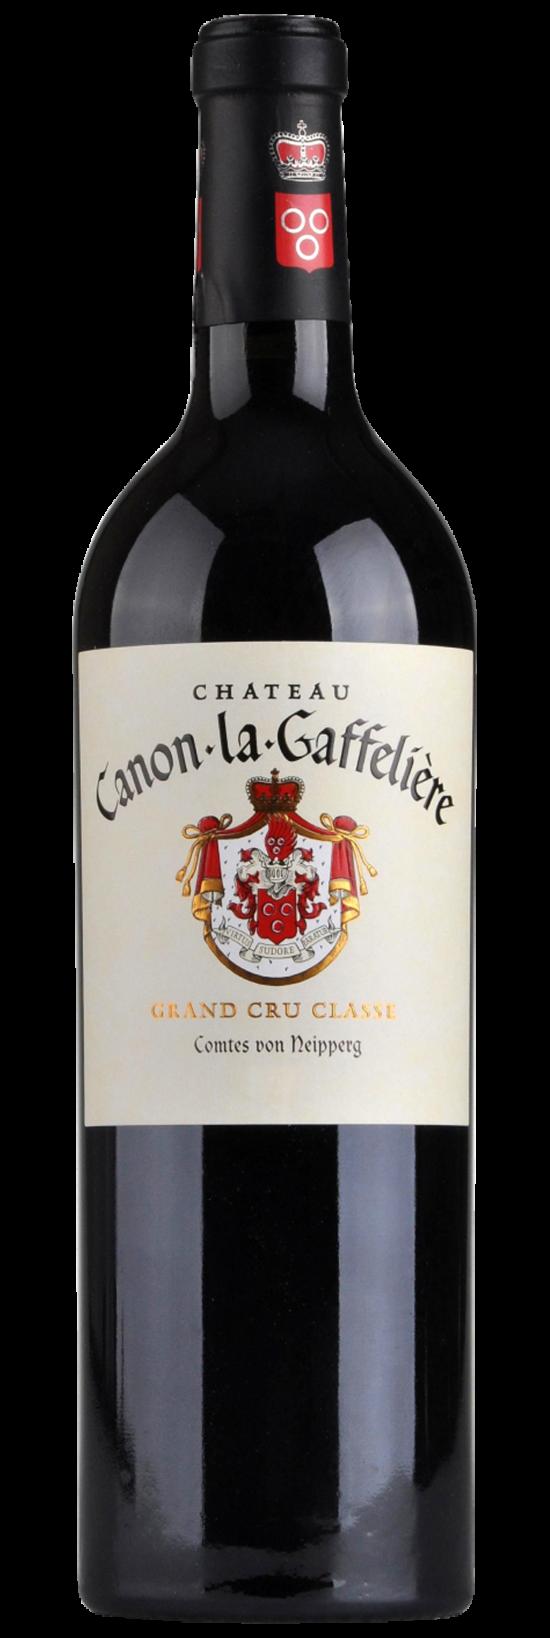 Chateau Canon La Gaffeliere St Emilion Grand Cru